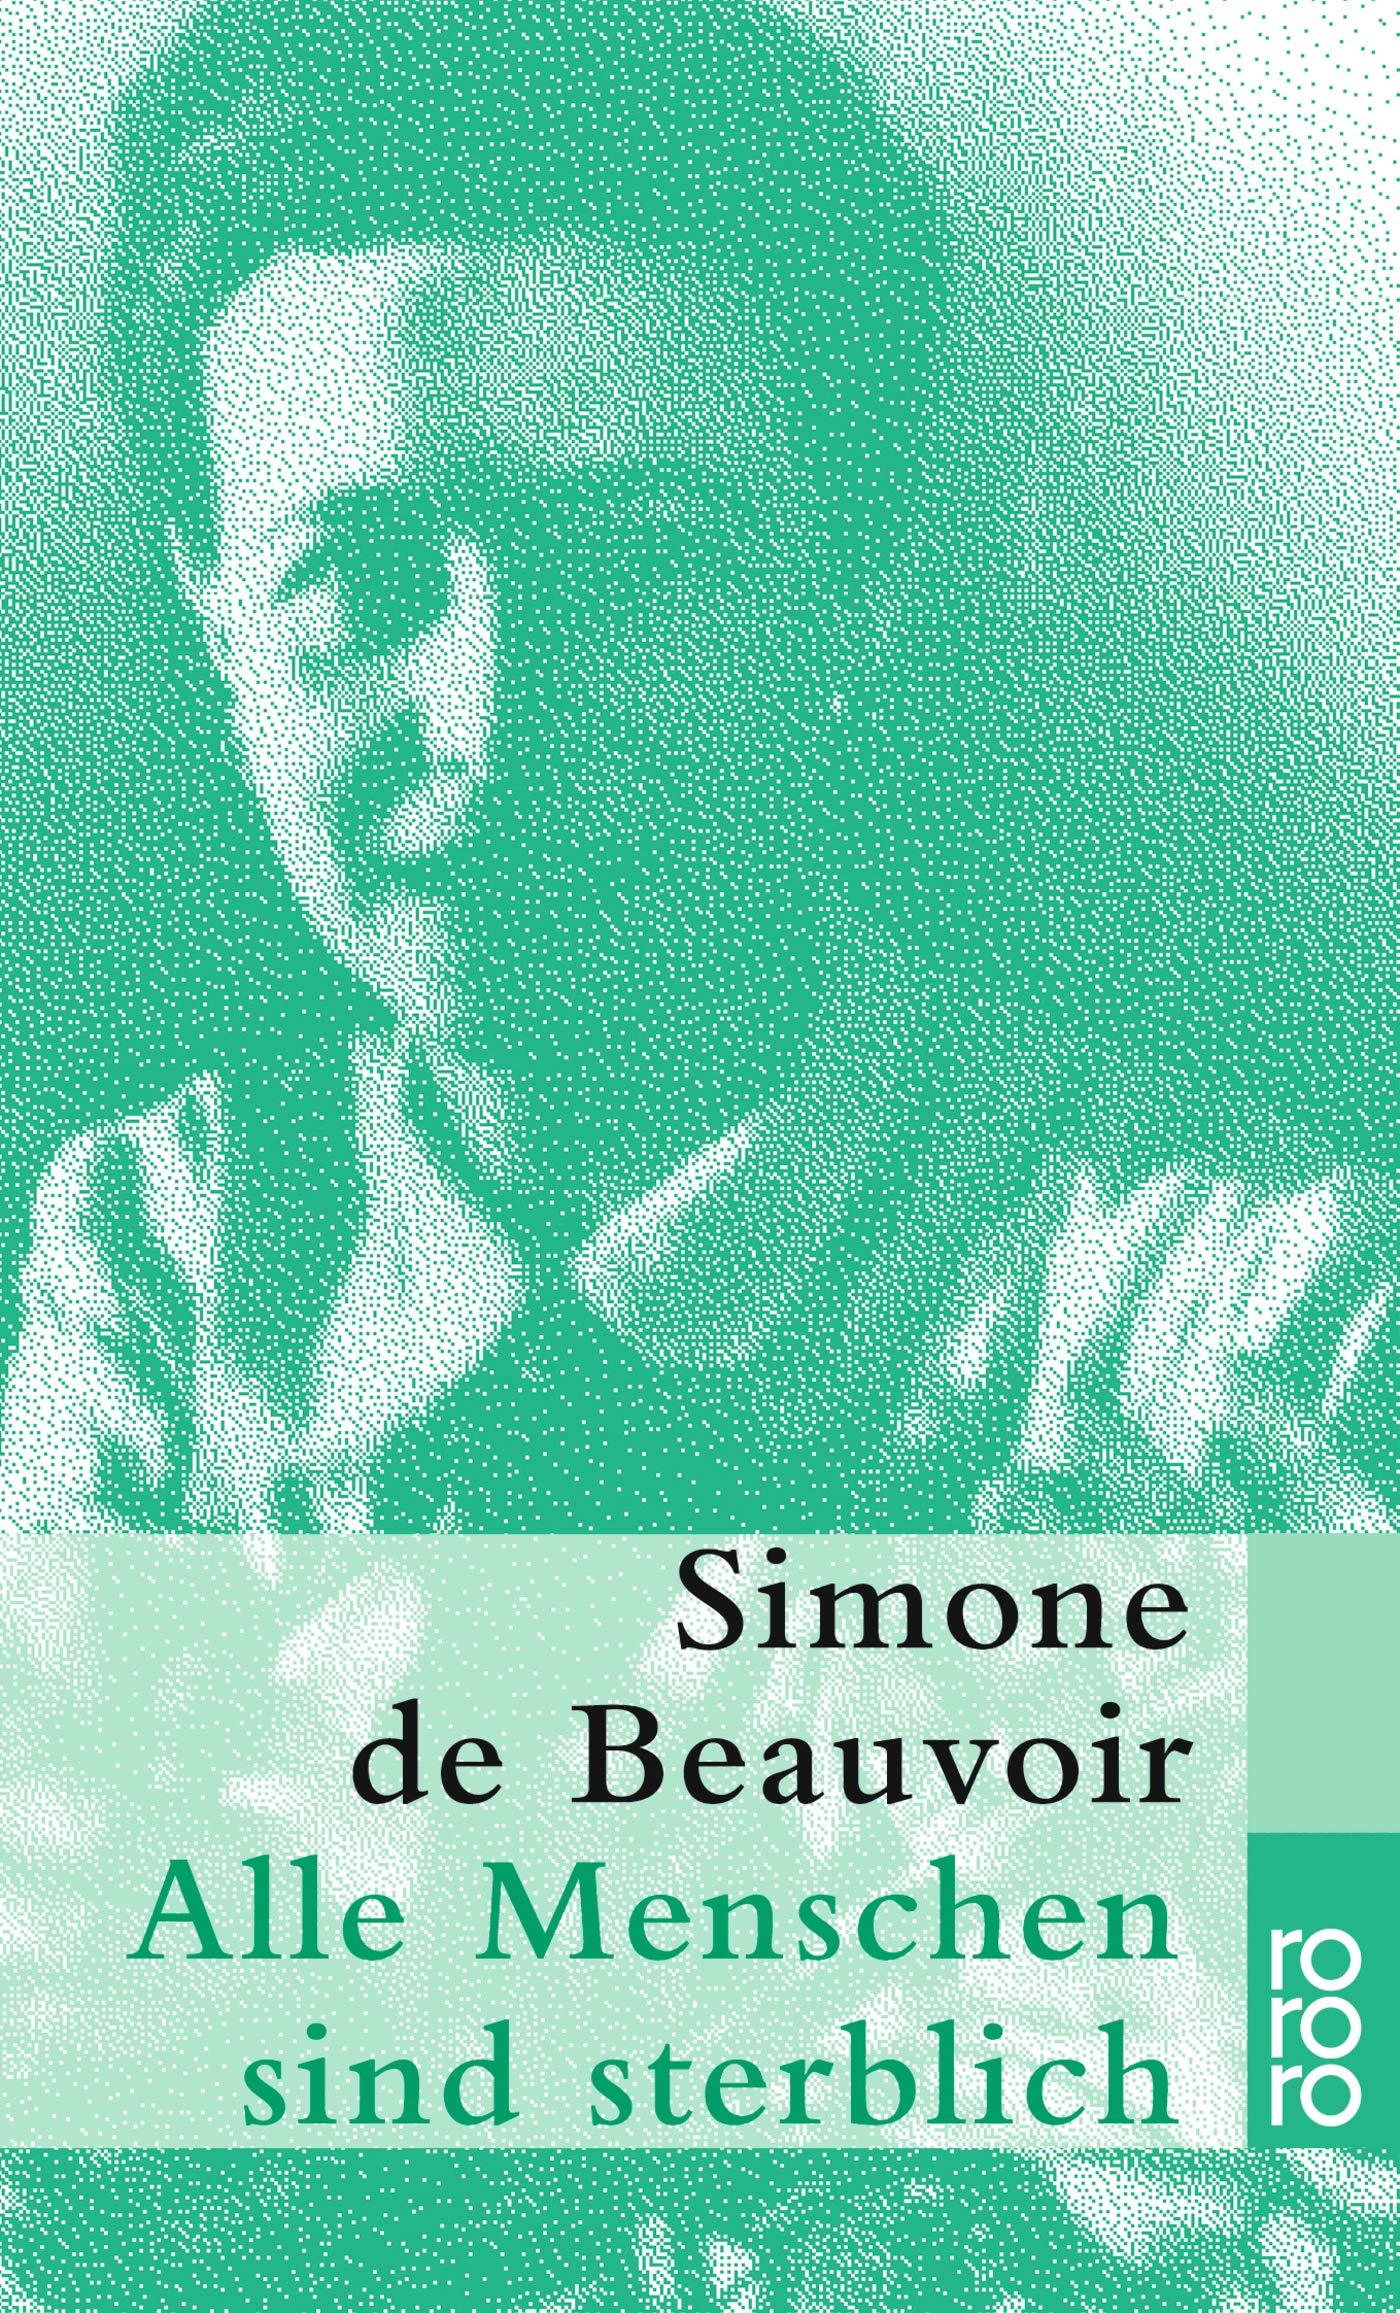 Alle Menschen Sind Sterblich Amazon De Simone De Beauvoir